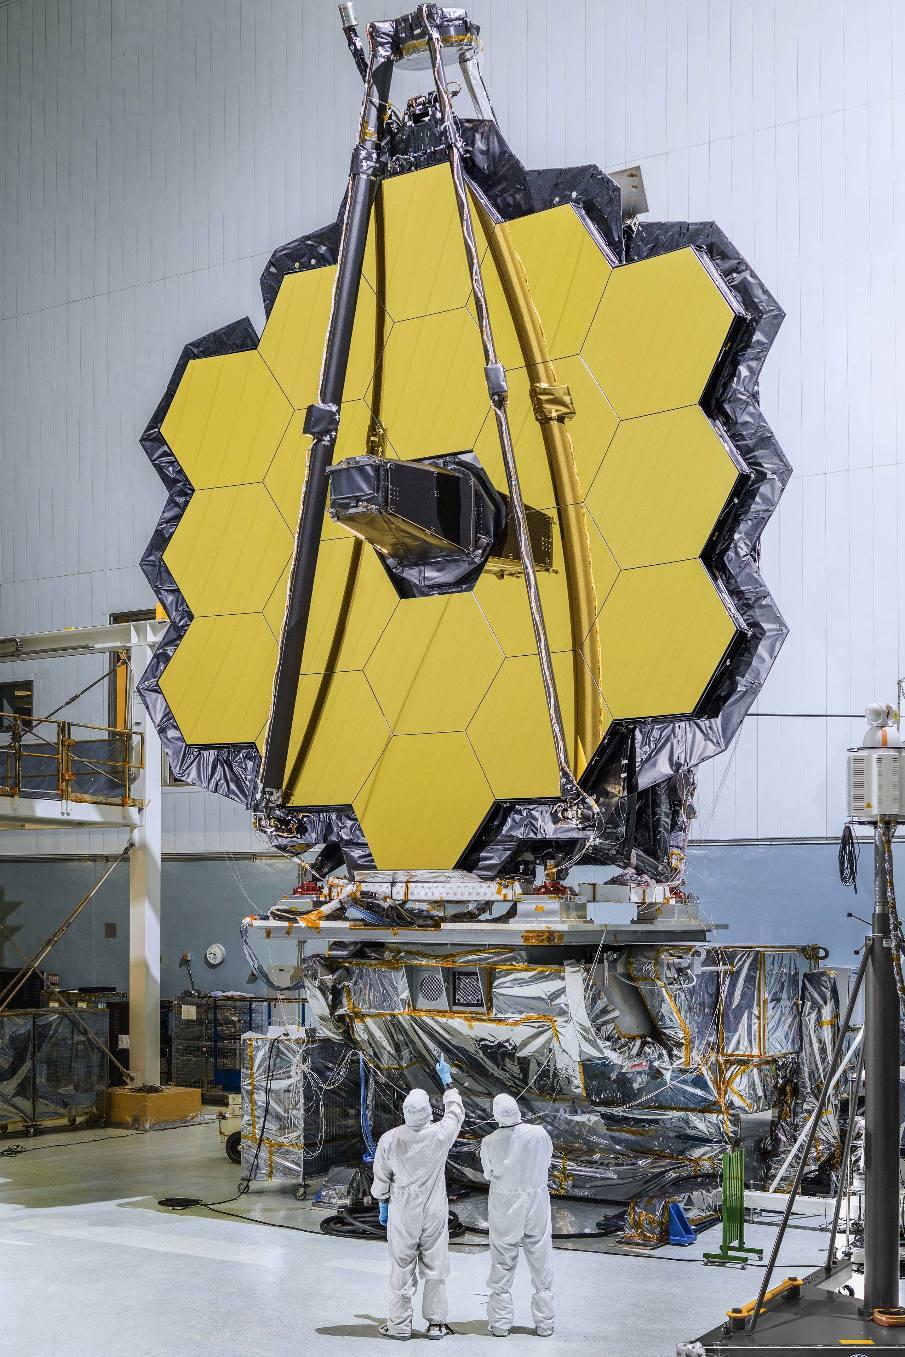 James Webb Space Telescope launch slips to 2019